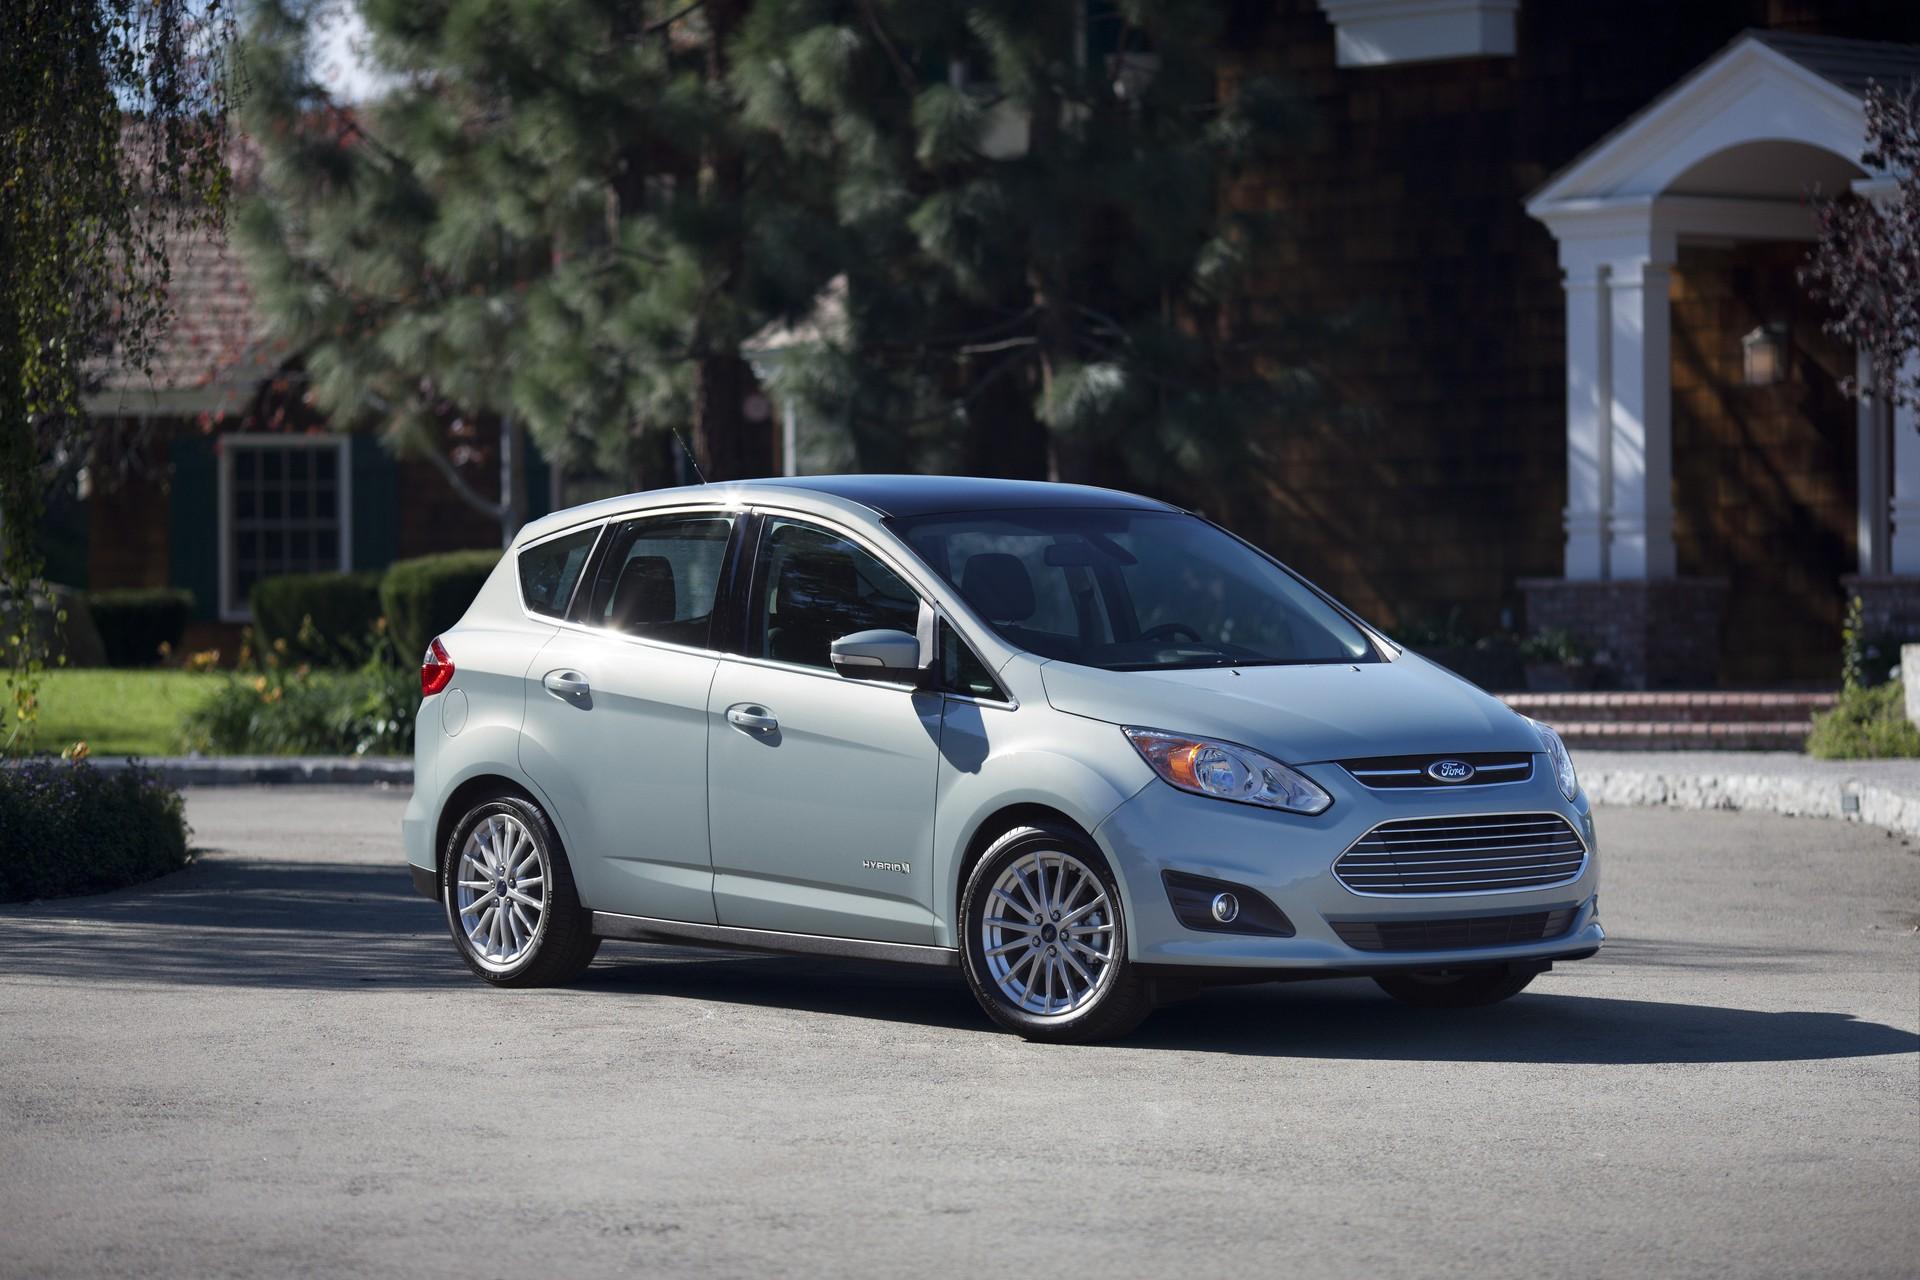 2015 Ford C-Max Ads To Downplay Twice-Cut Gas Mileage, Focus On Fun, Tech